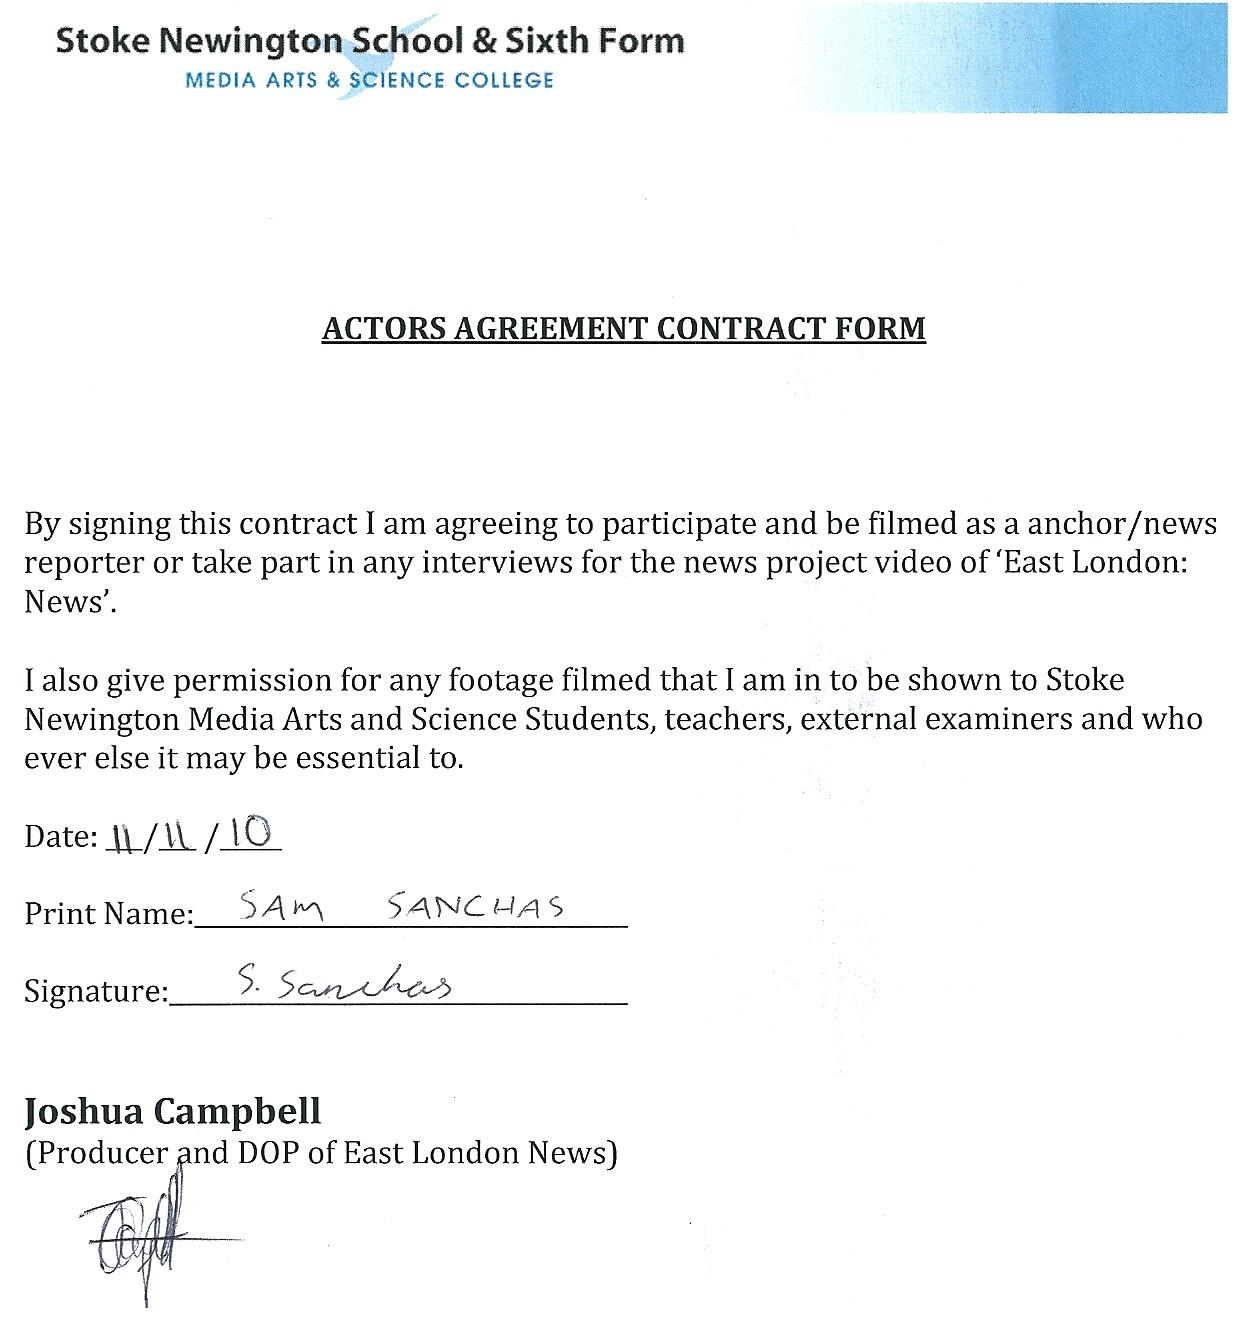 Simple Contract Agreement Template - Virtren.com